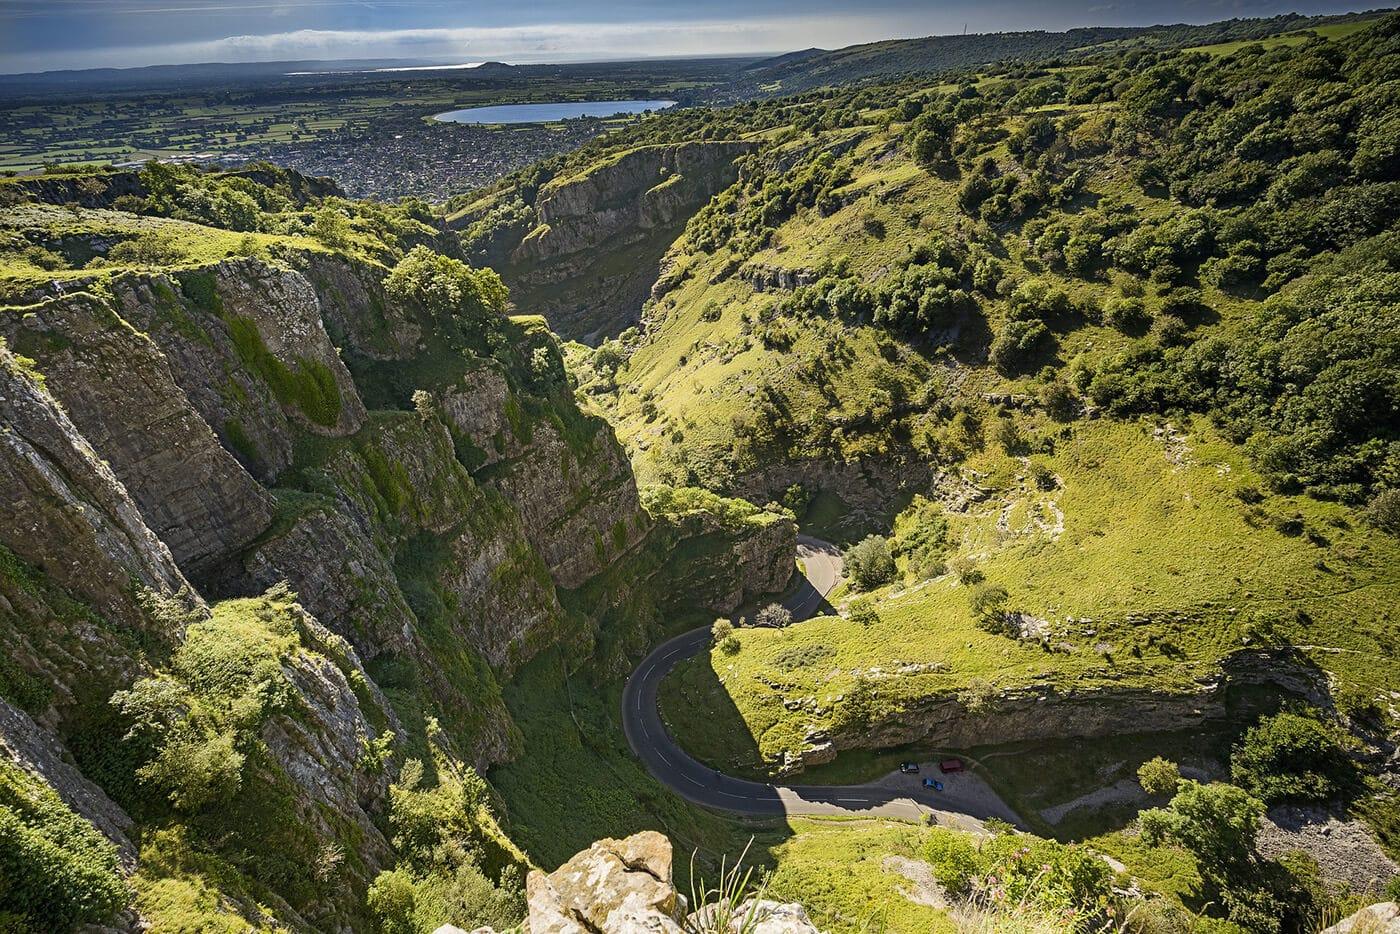 5-Cheddar Gorge, Somerset, England